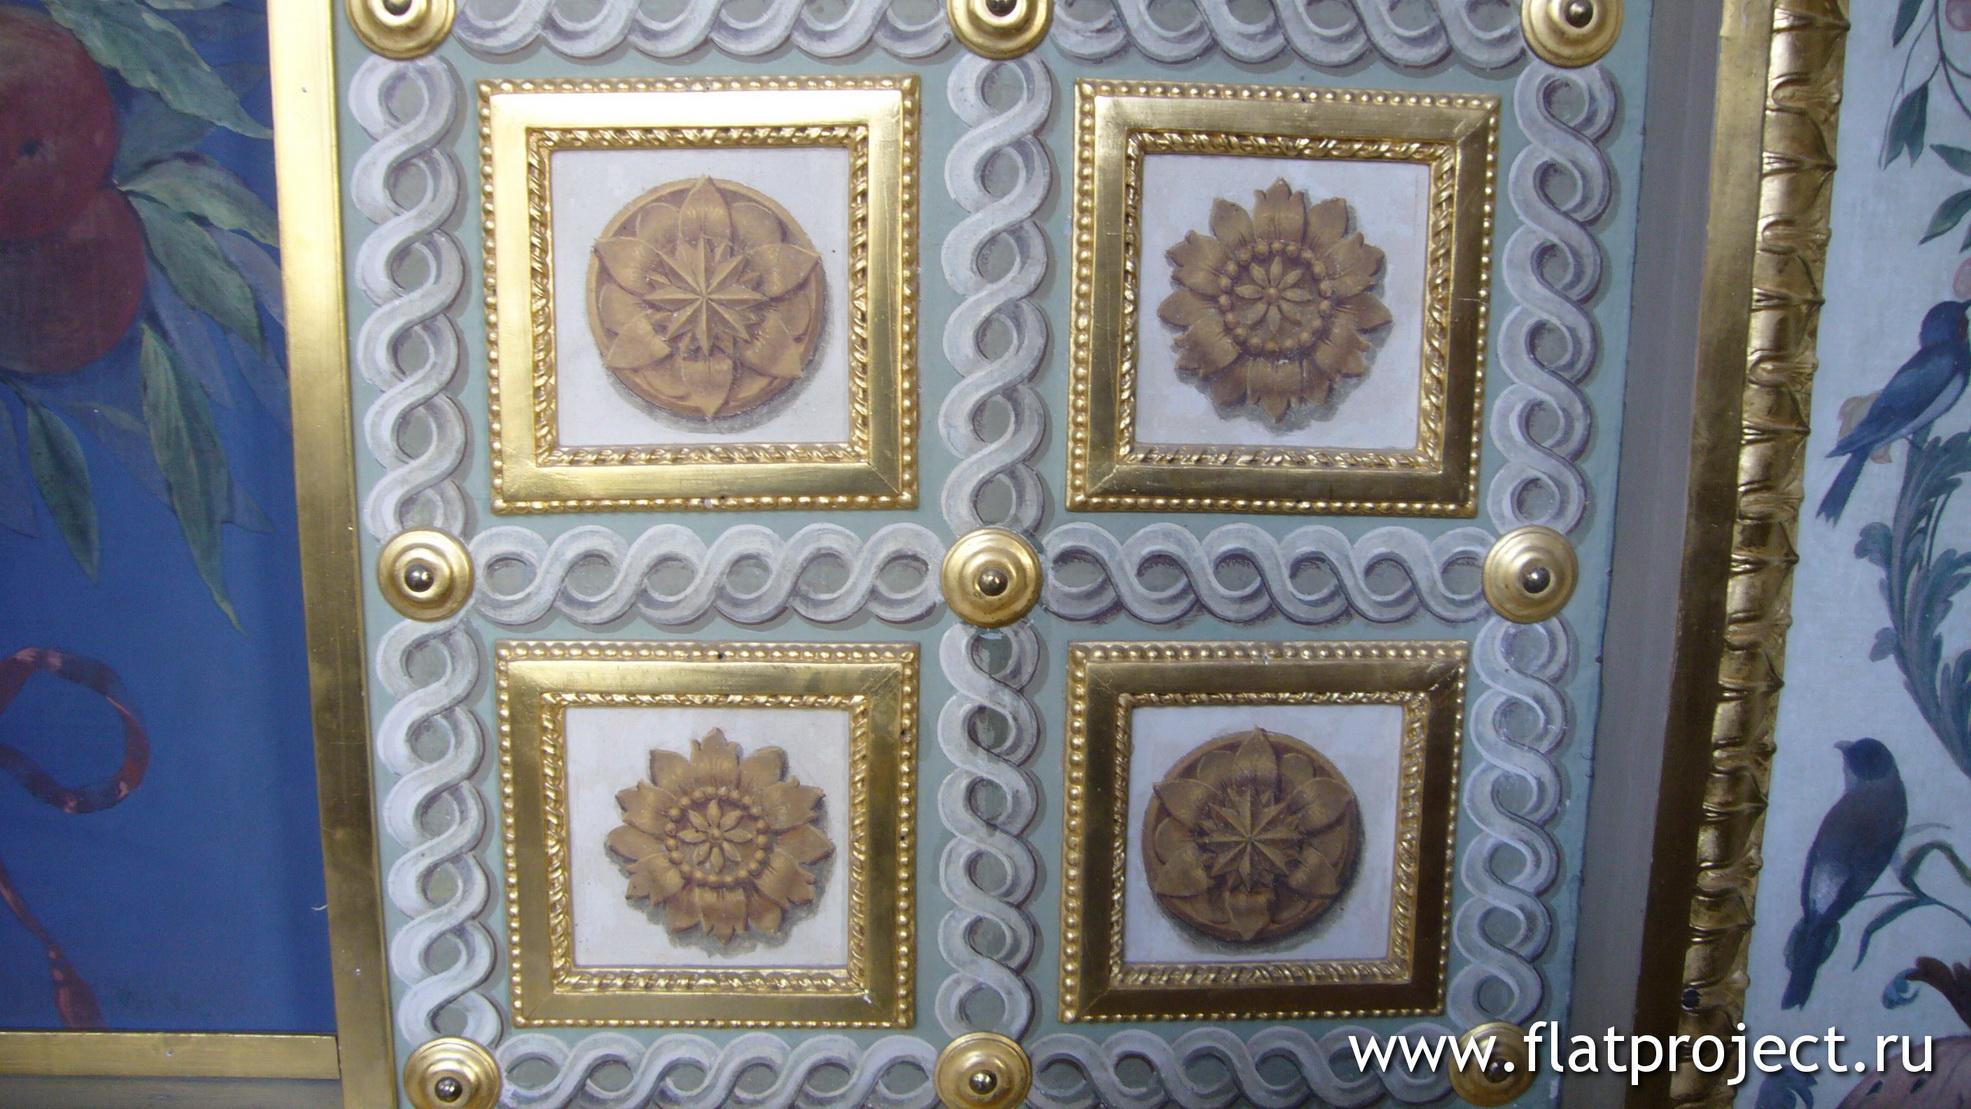 The State Hermitage museum interiors – photo 203